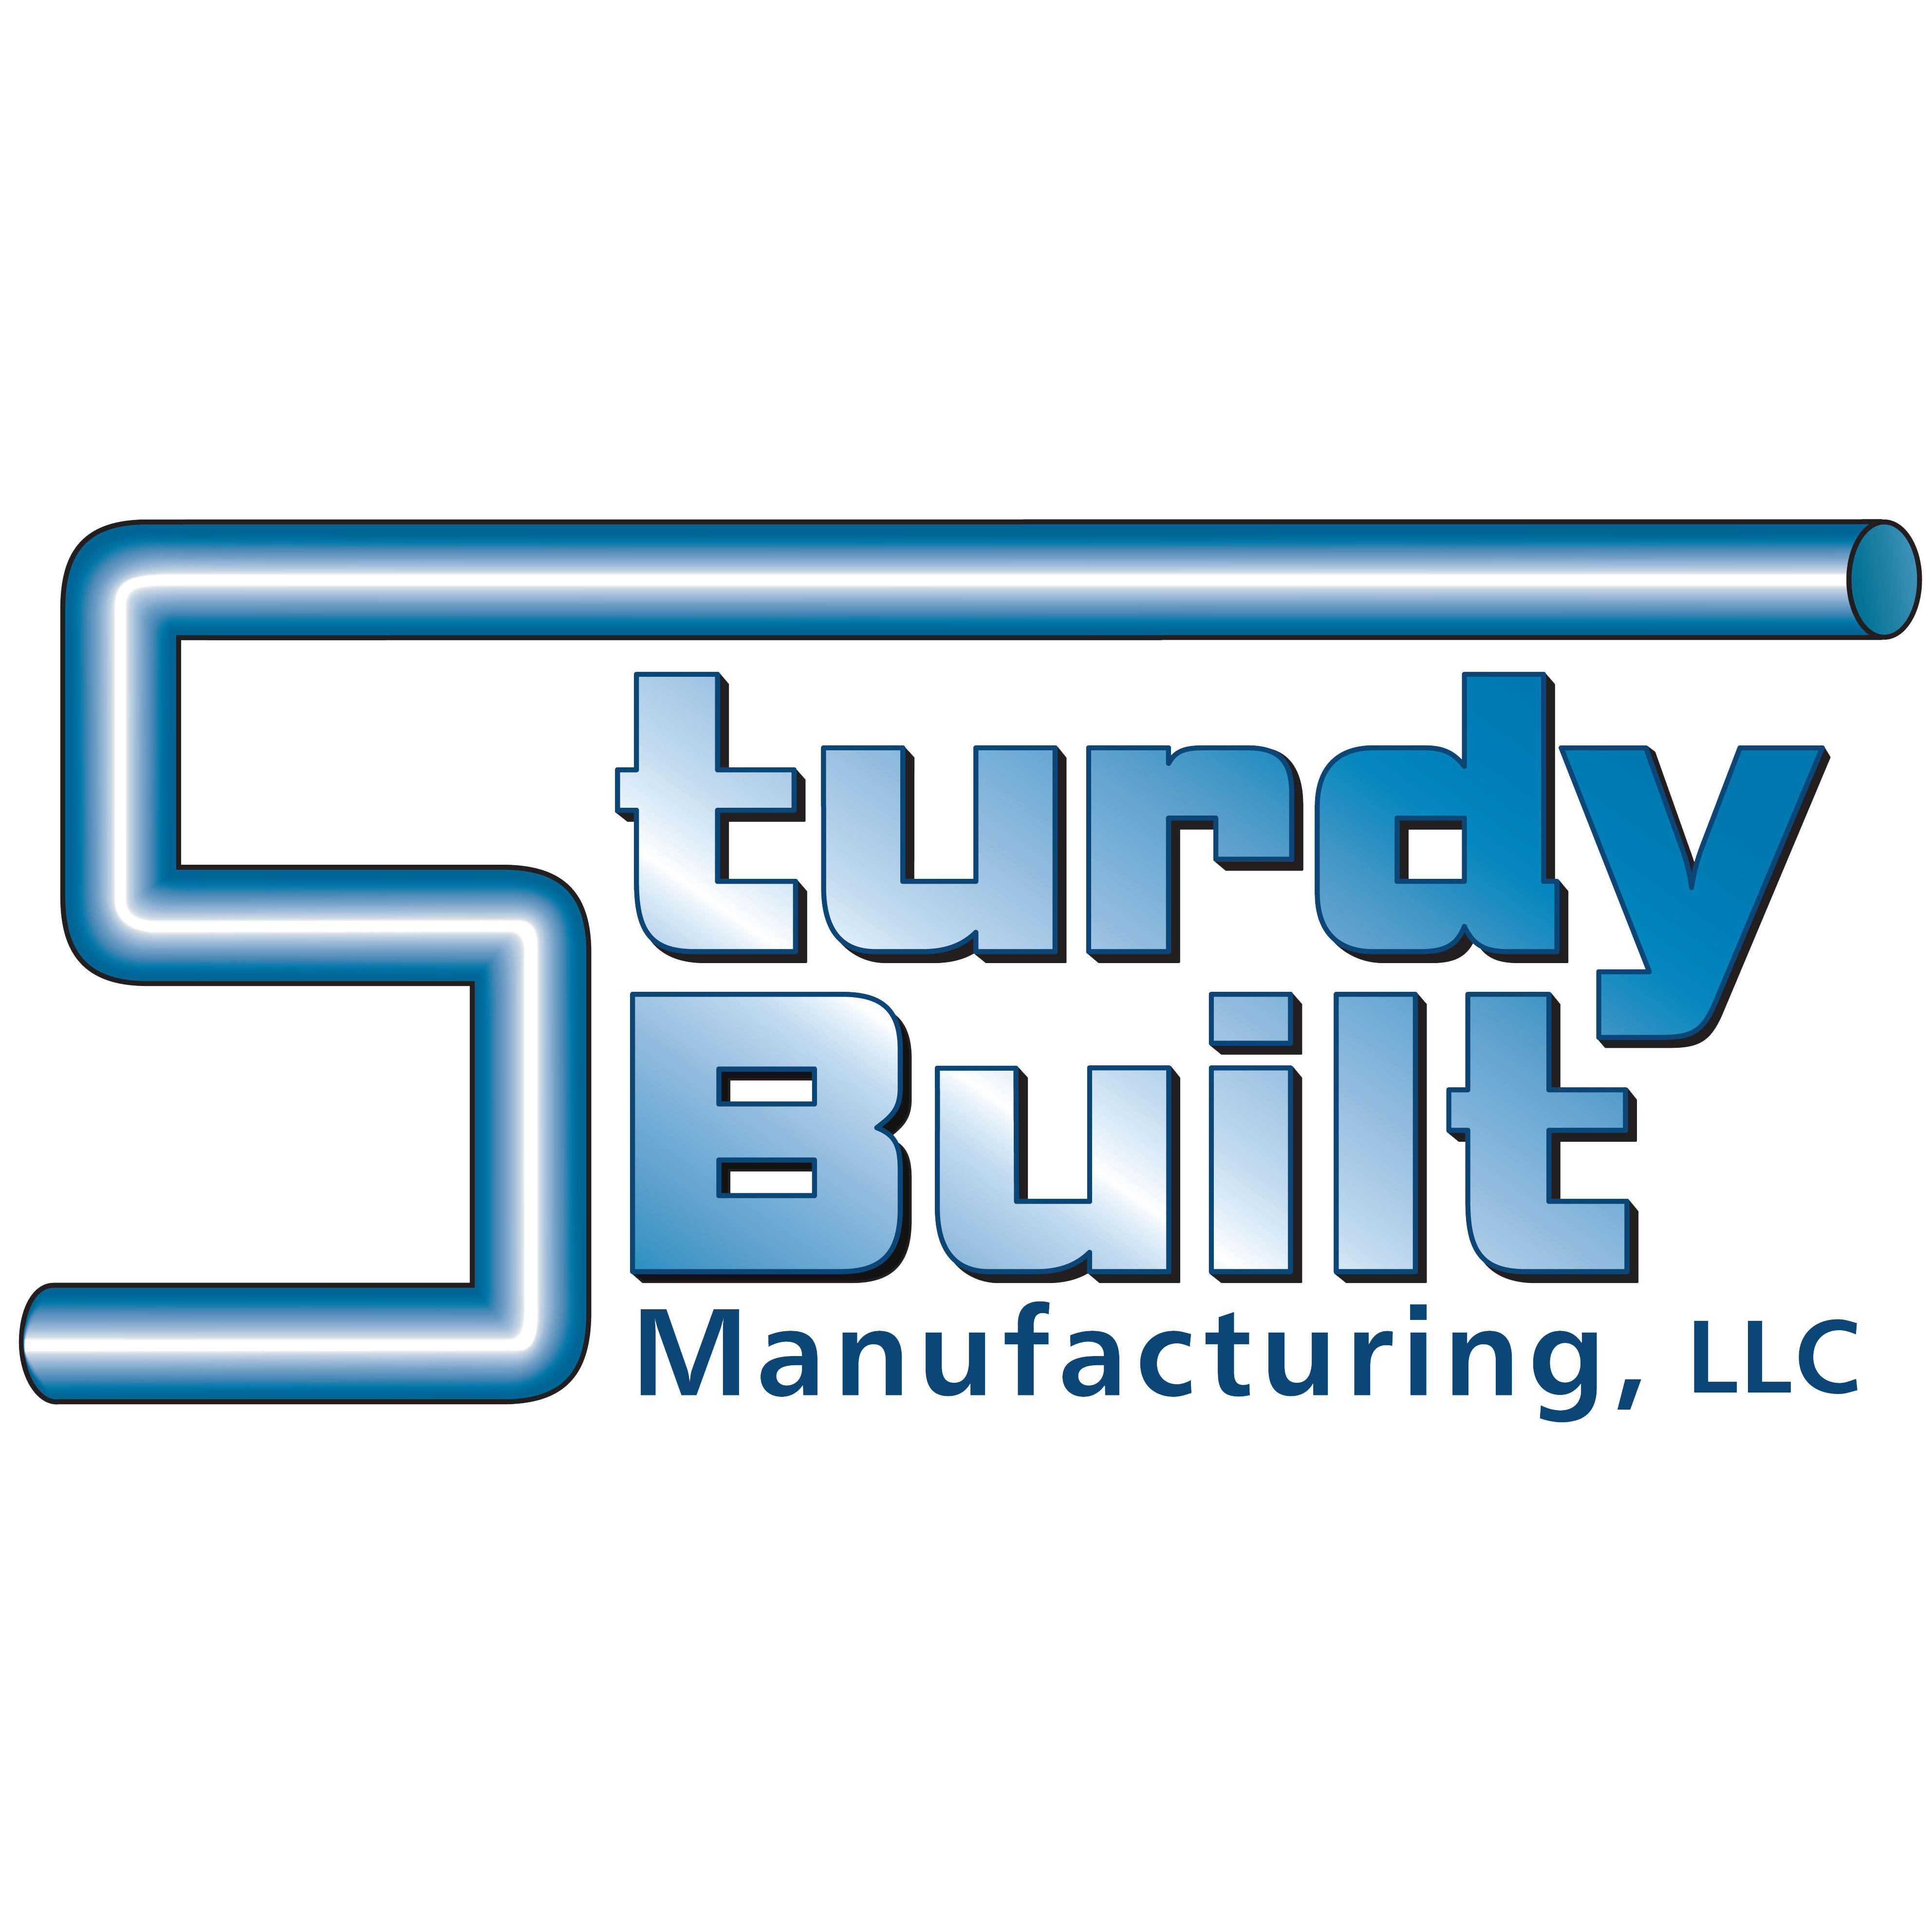 Sturdy Built Manufacturing, LLC